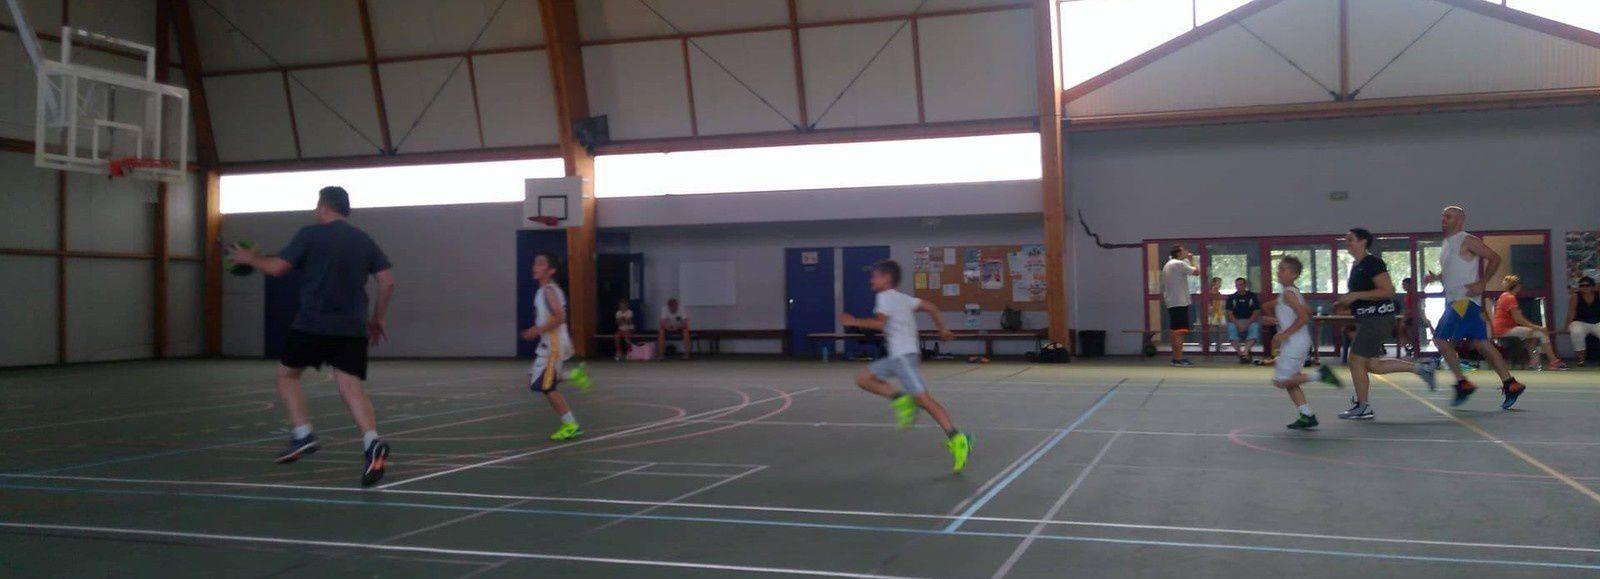 samedi 24/06/2017 AJCBasketball